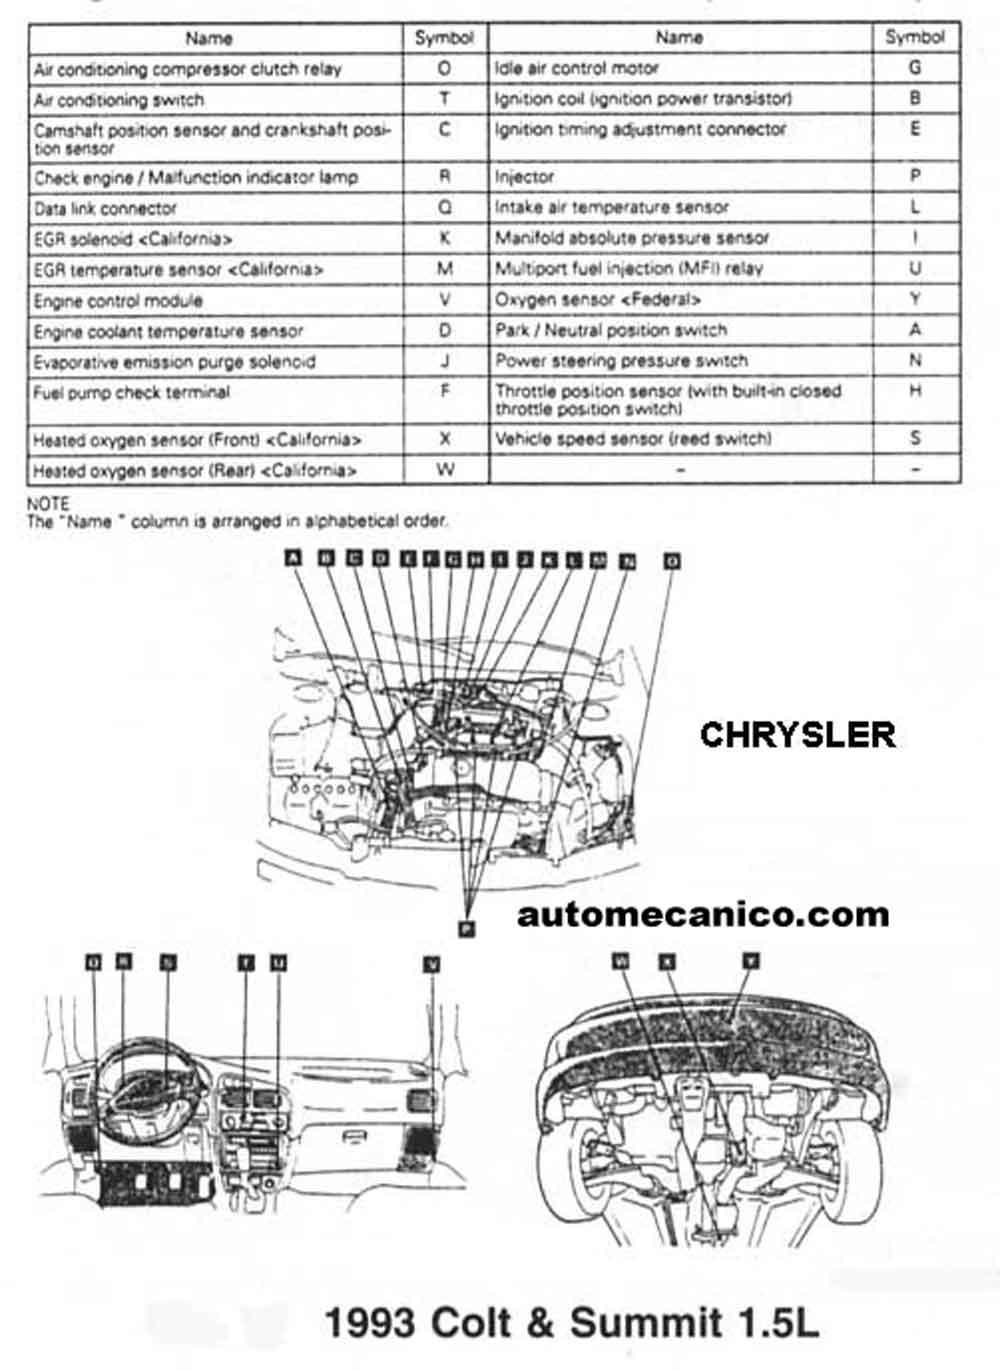 1993 Motor 1.5L